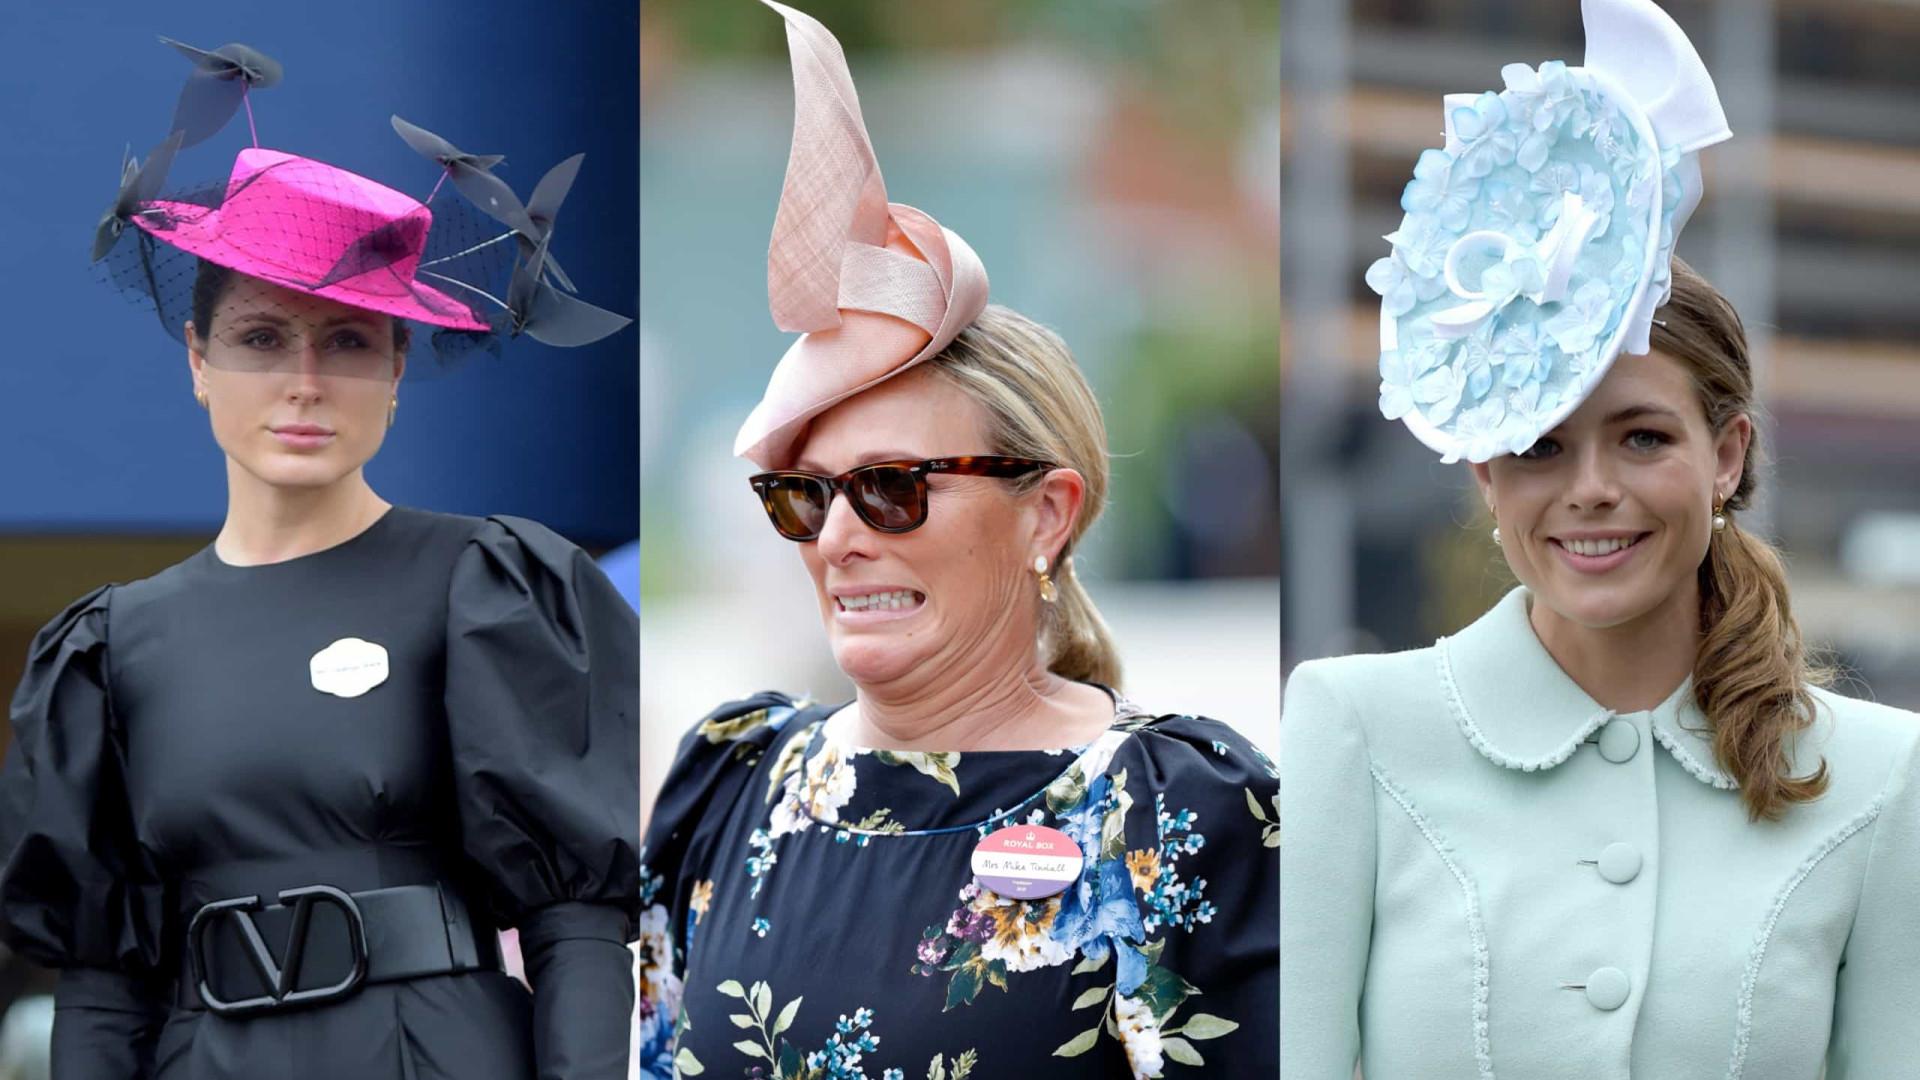 Chapéus, os protagonistas do terceiro dia do Royal Ascot